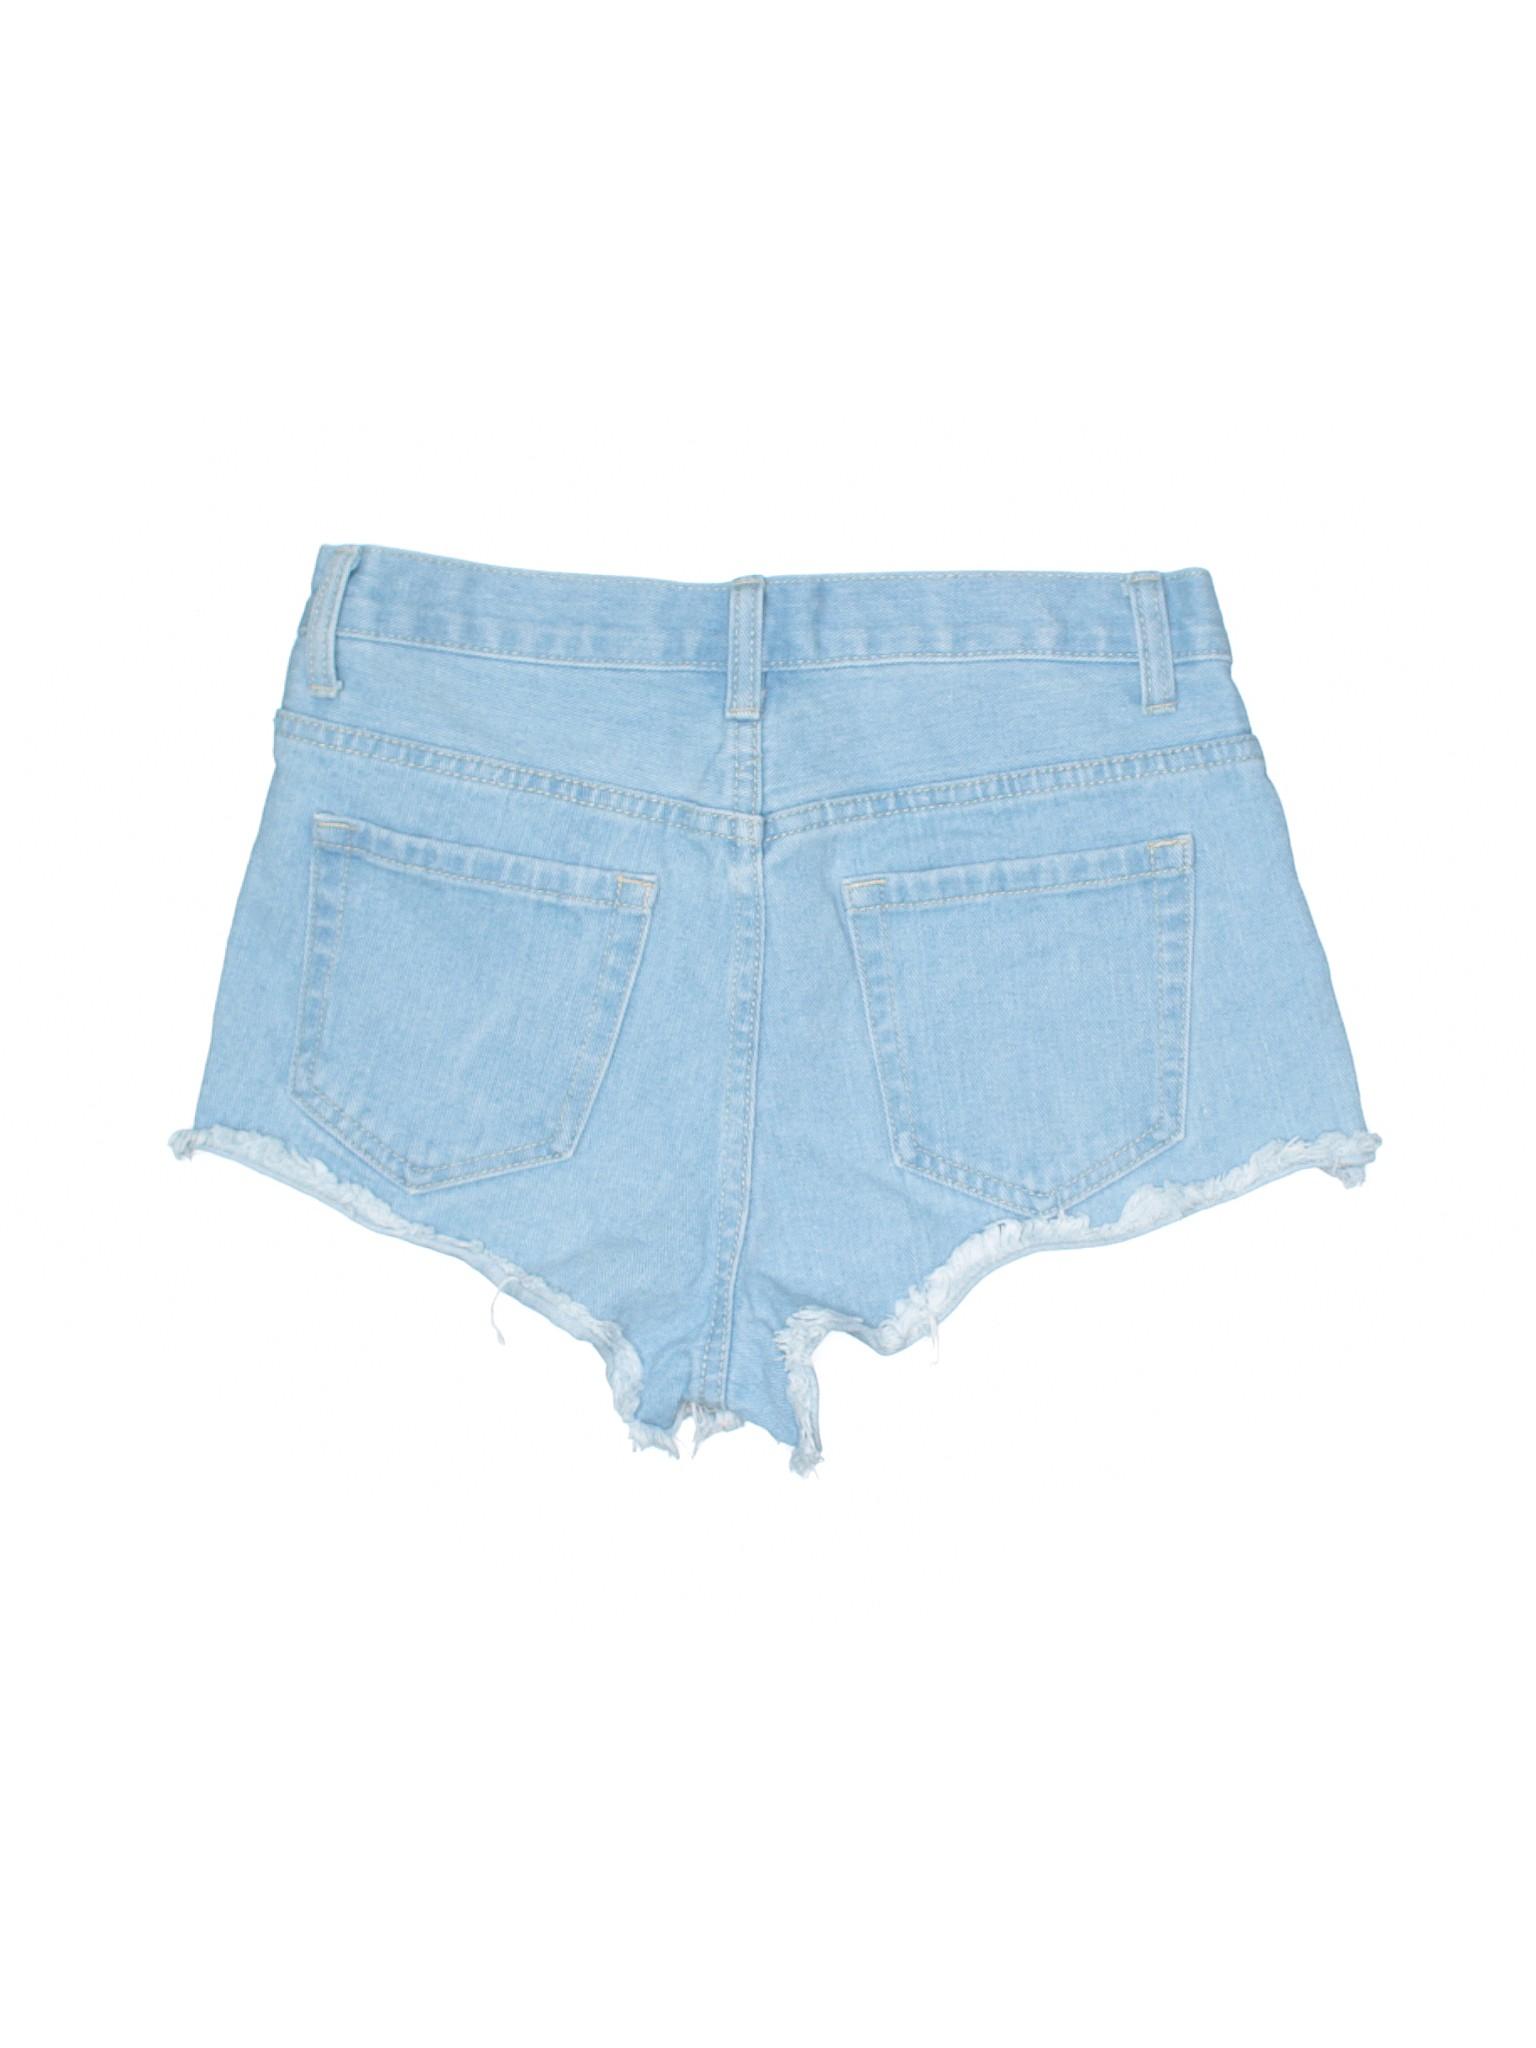 Shorts Boutique Denim Forever leisure 21 wSSIqa8